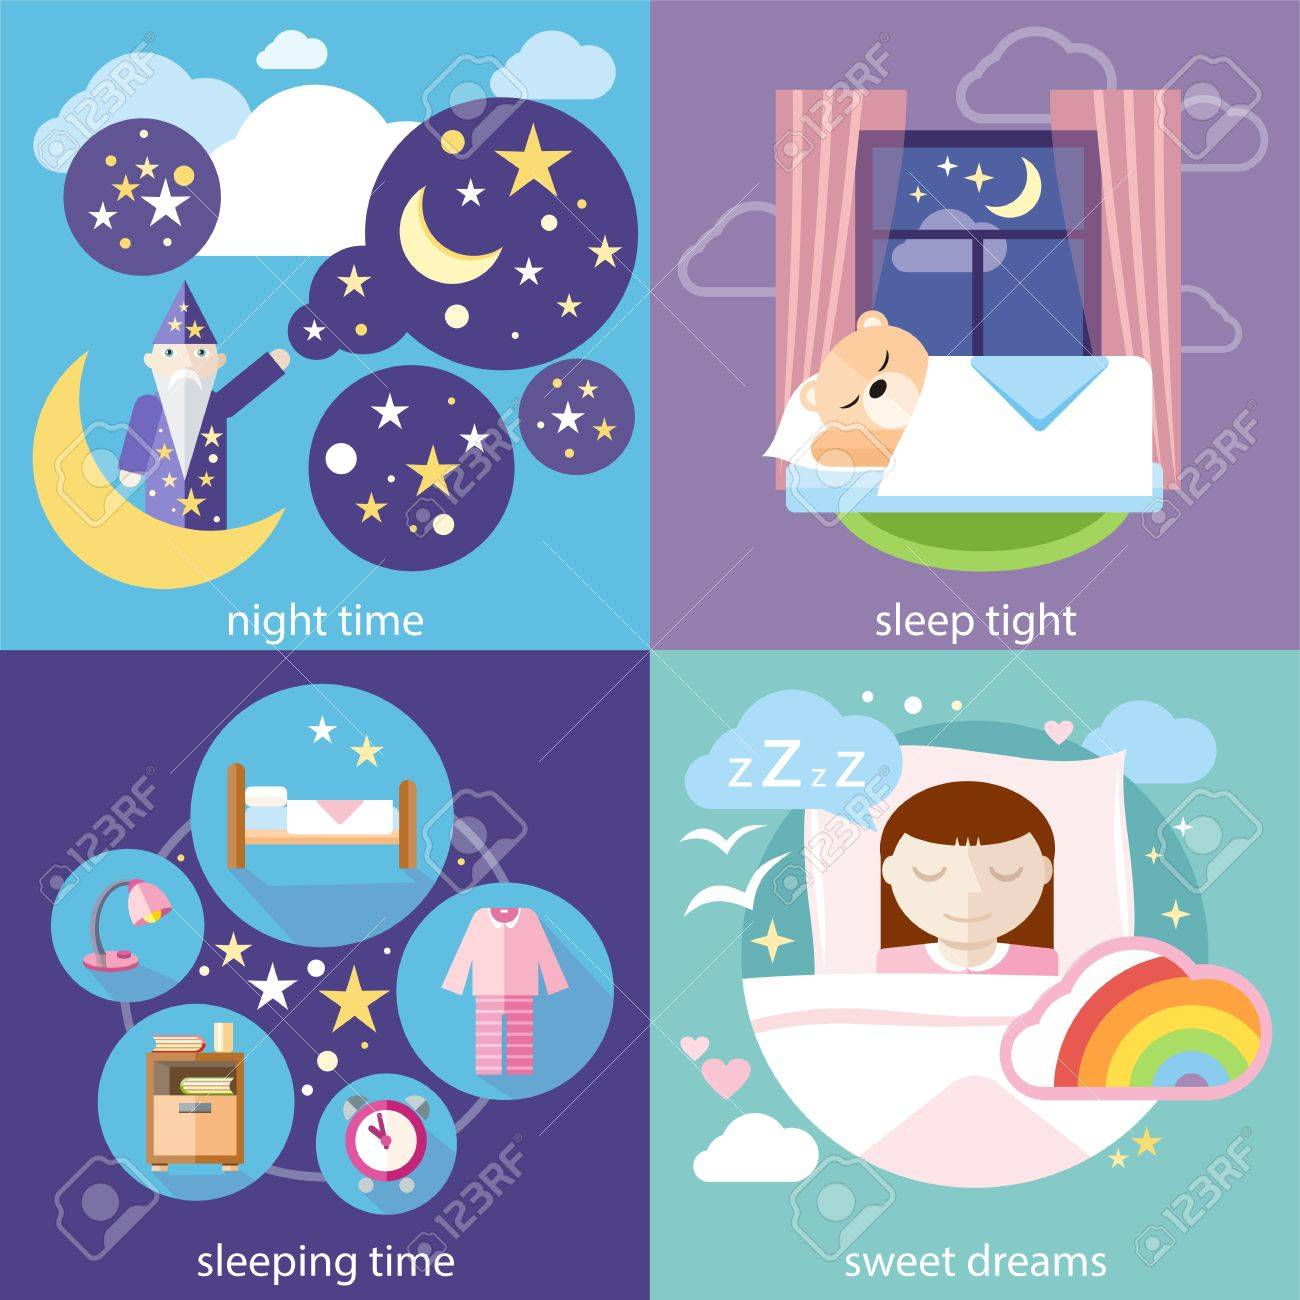 Bedroom at night time - Cartoon Night Time Bedroom Stock Illustration Sleep Tight